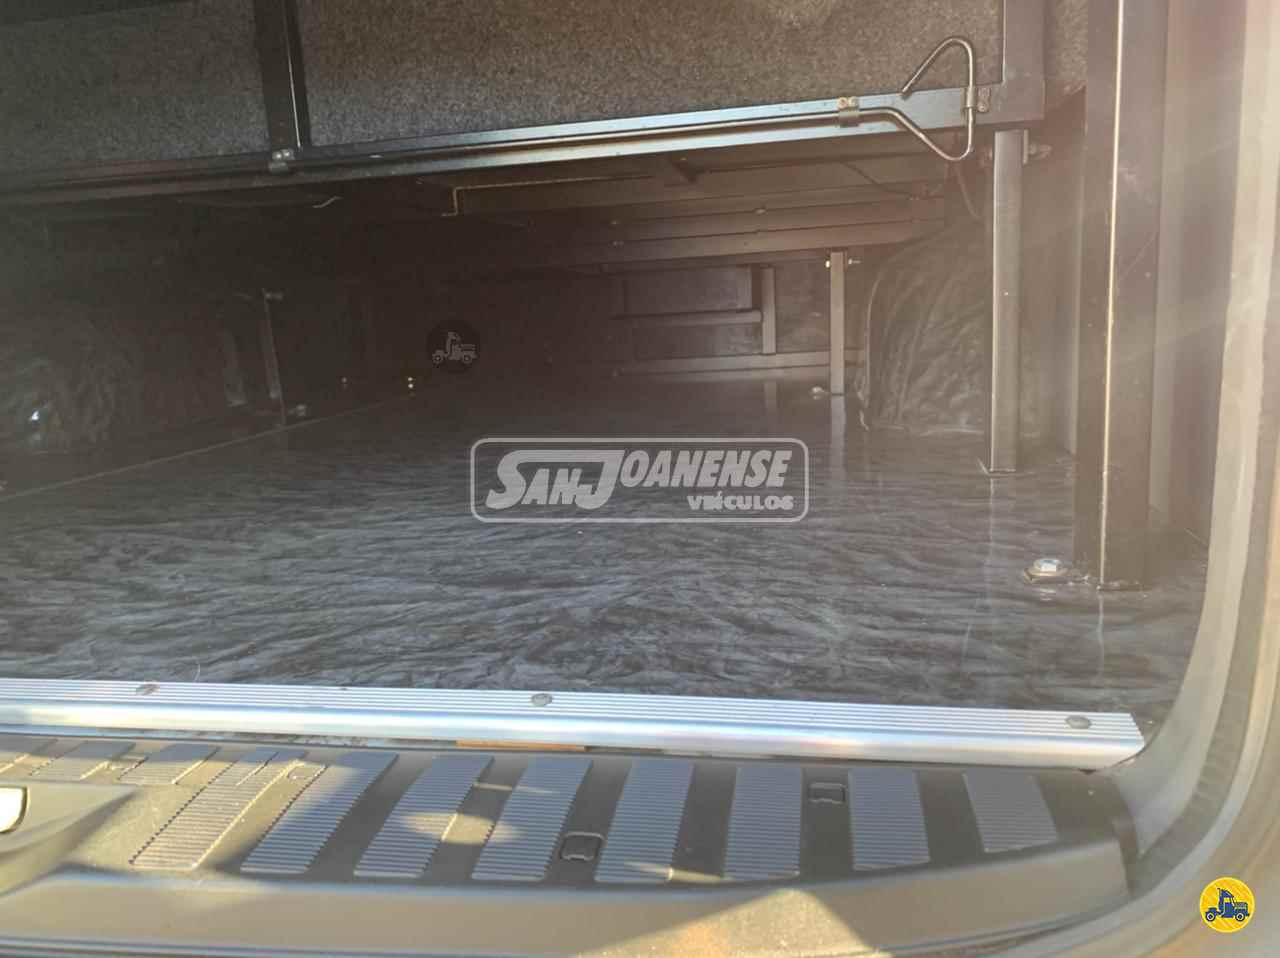 MERCEDES-BENZ Sprinter VAN 415 195000km 2017/2017 Sanjoanense Veículos